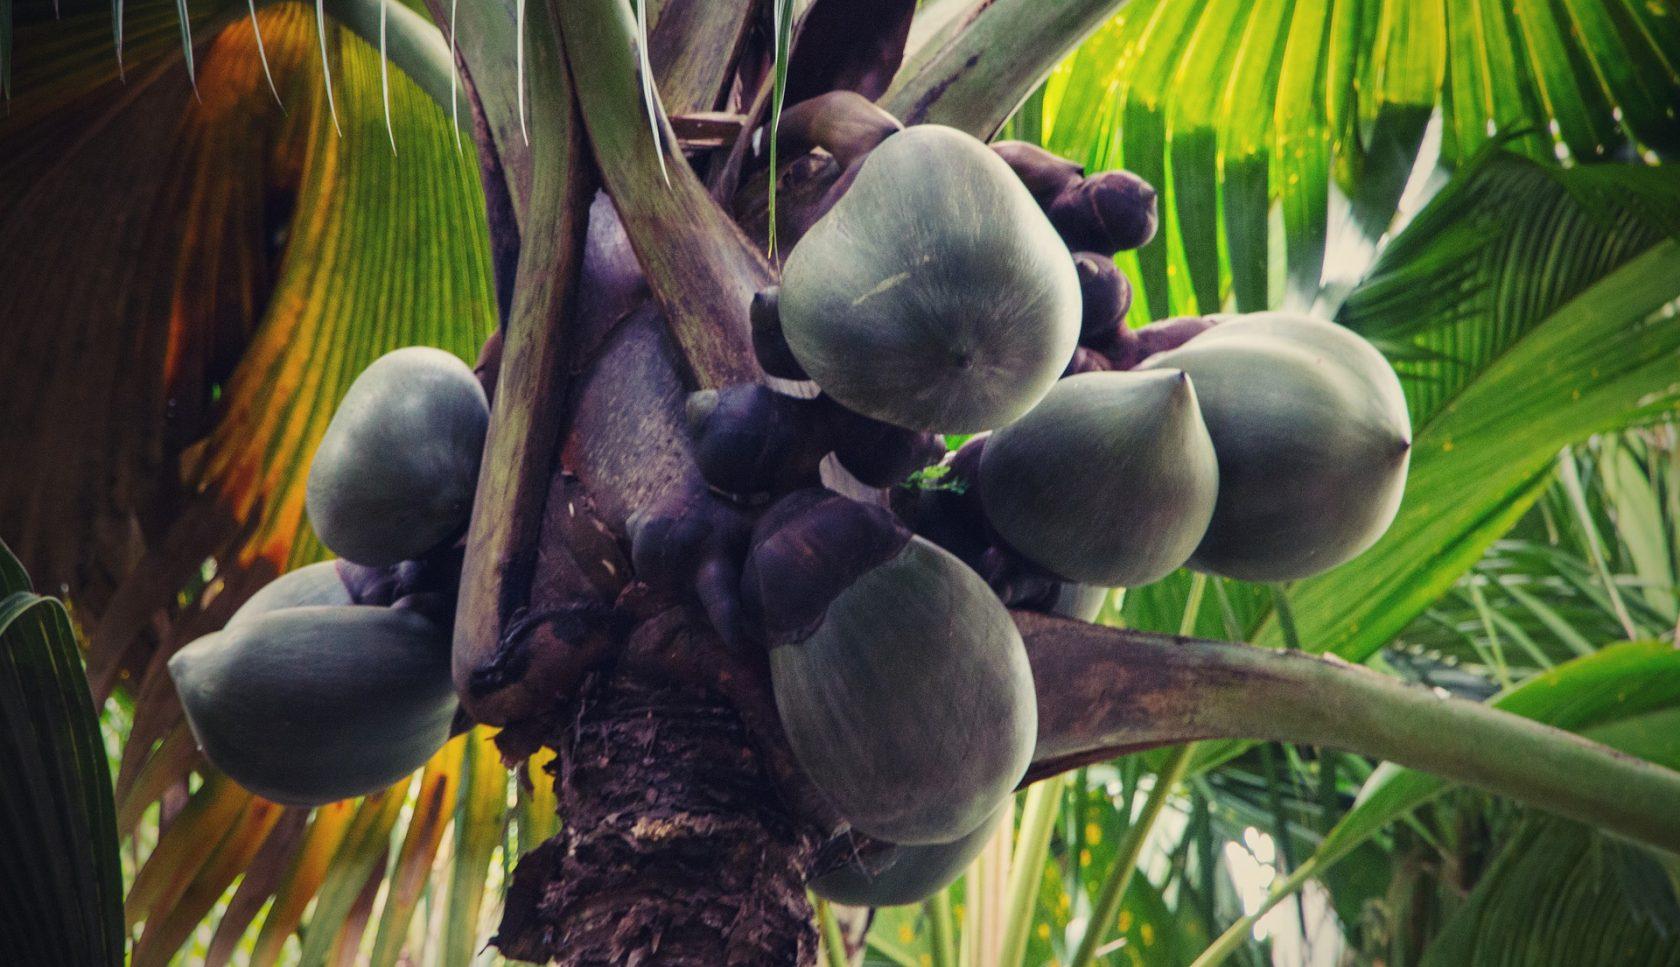 Rundreise Seychellen – Inselhopping Mahé, Praslin, La Digue